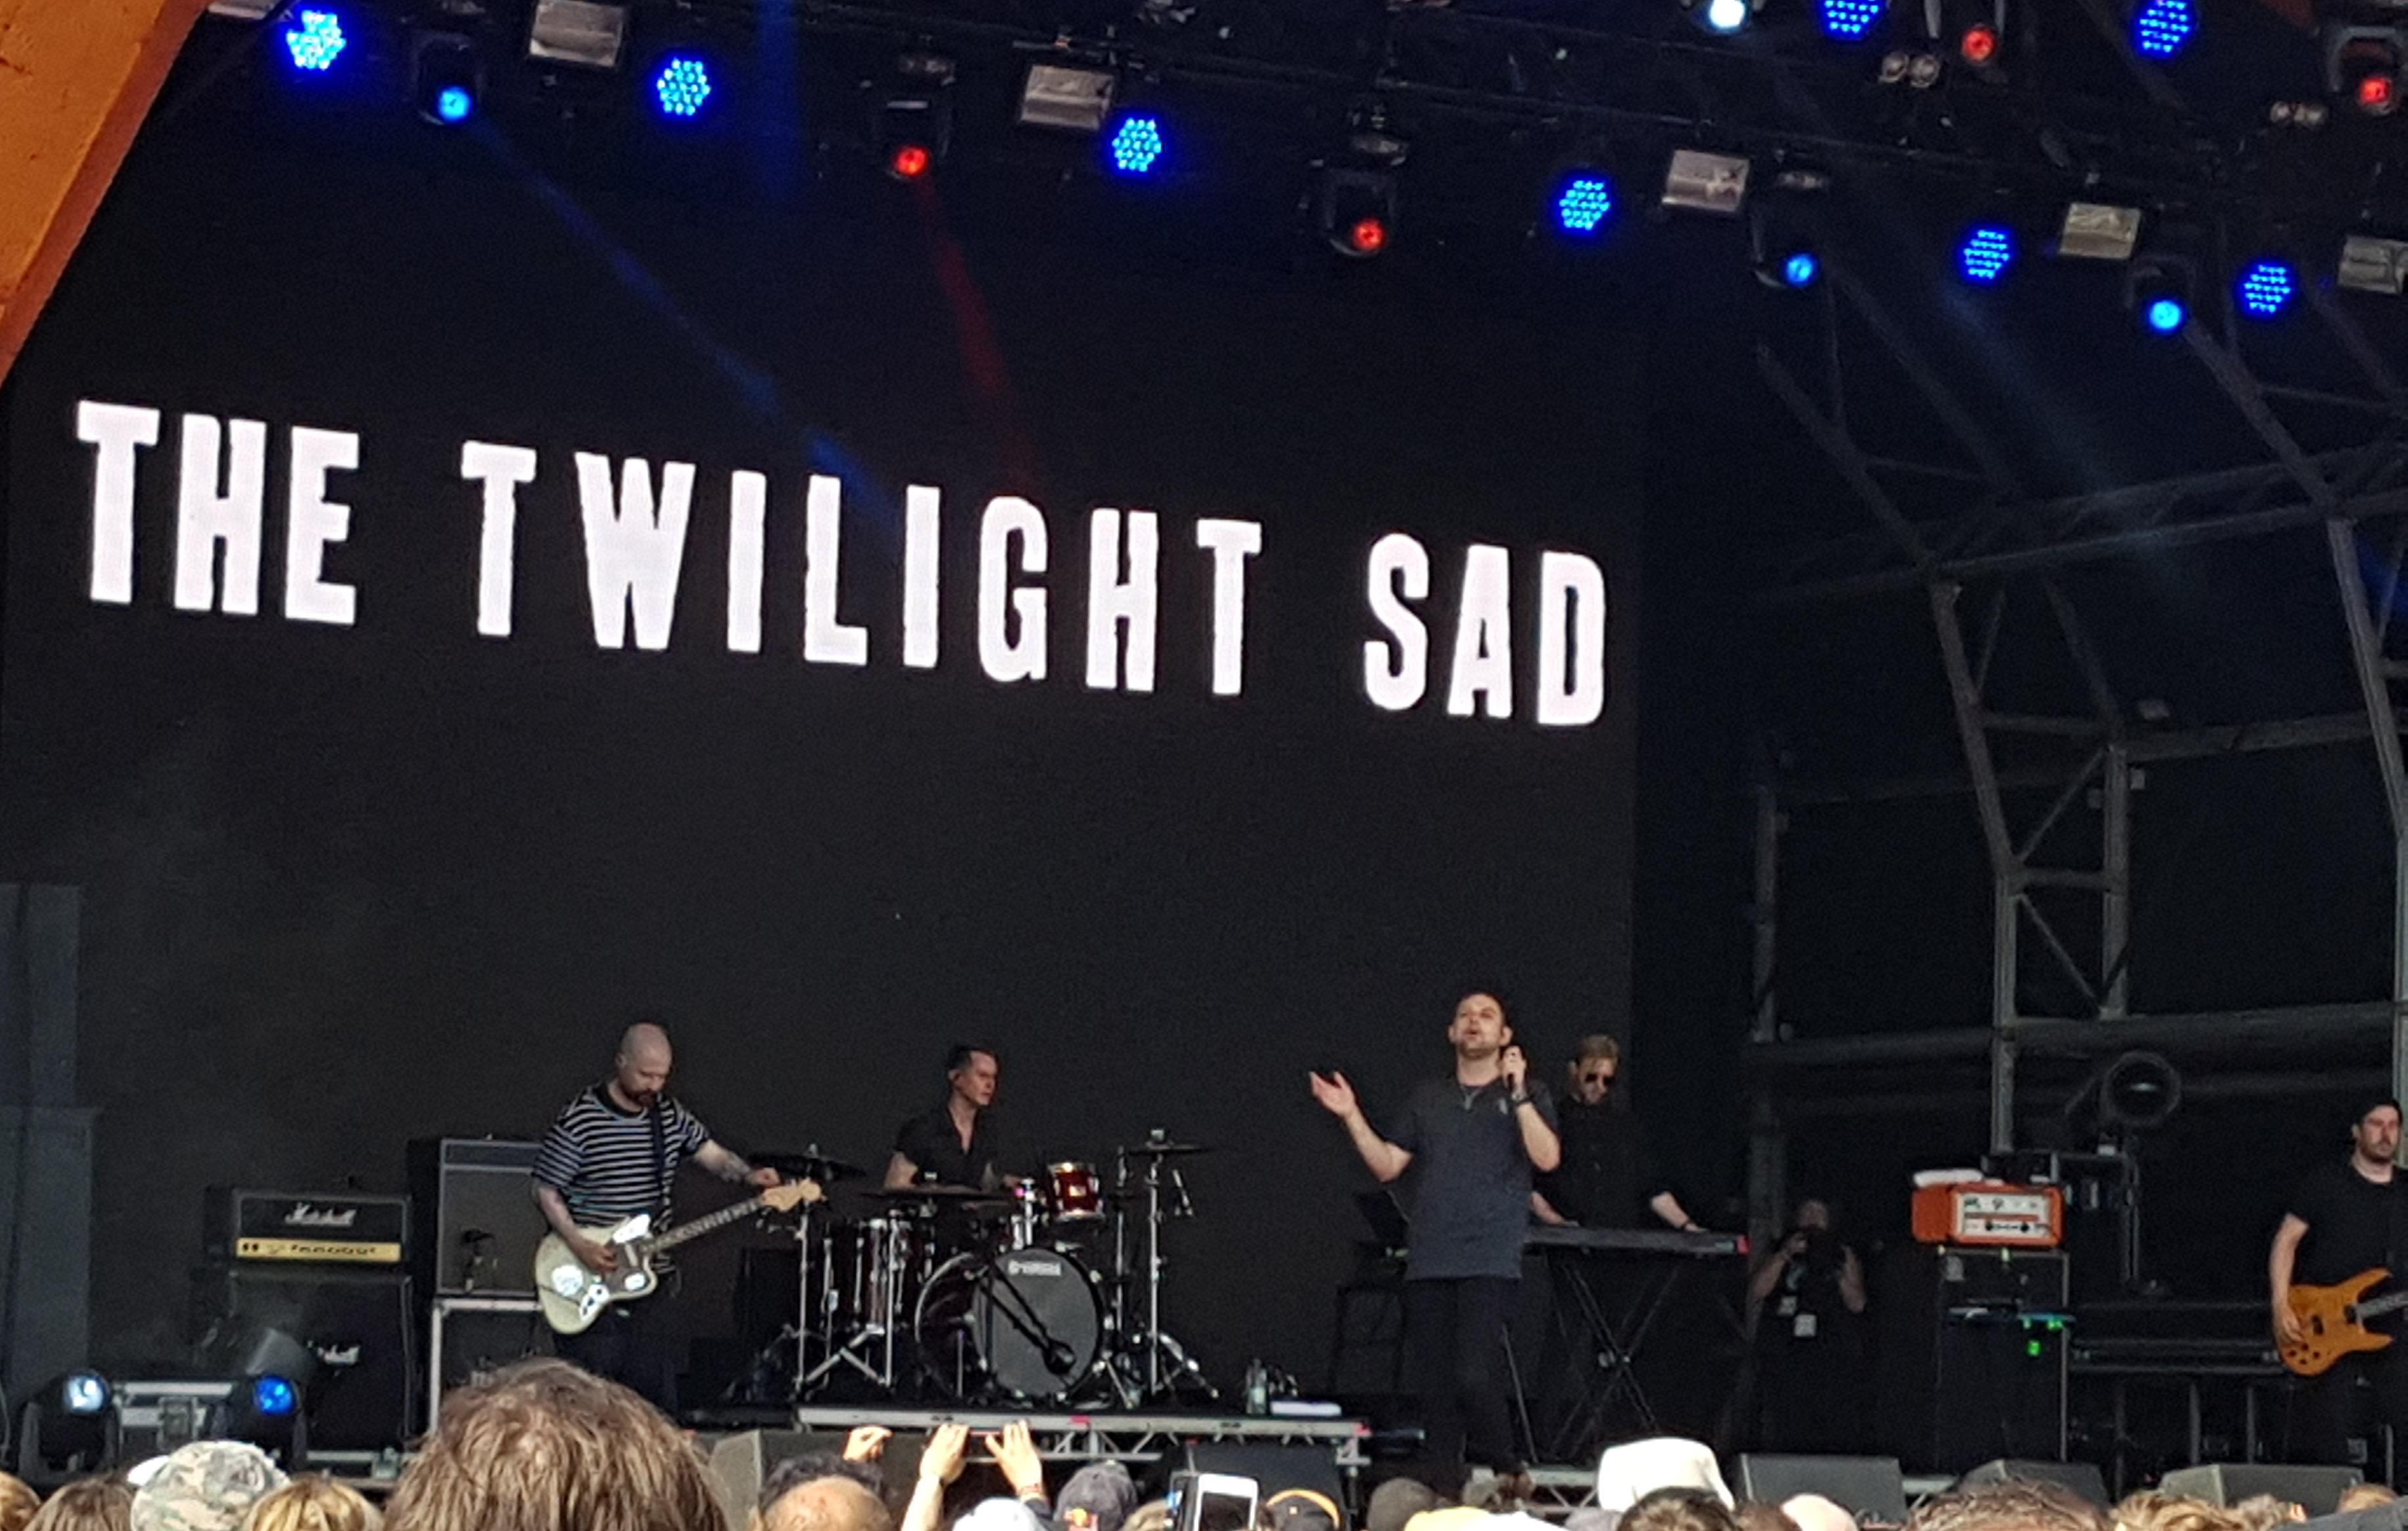 The Twilight Sad - Wikipedia